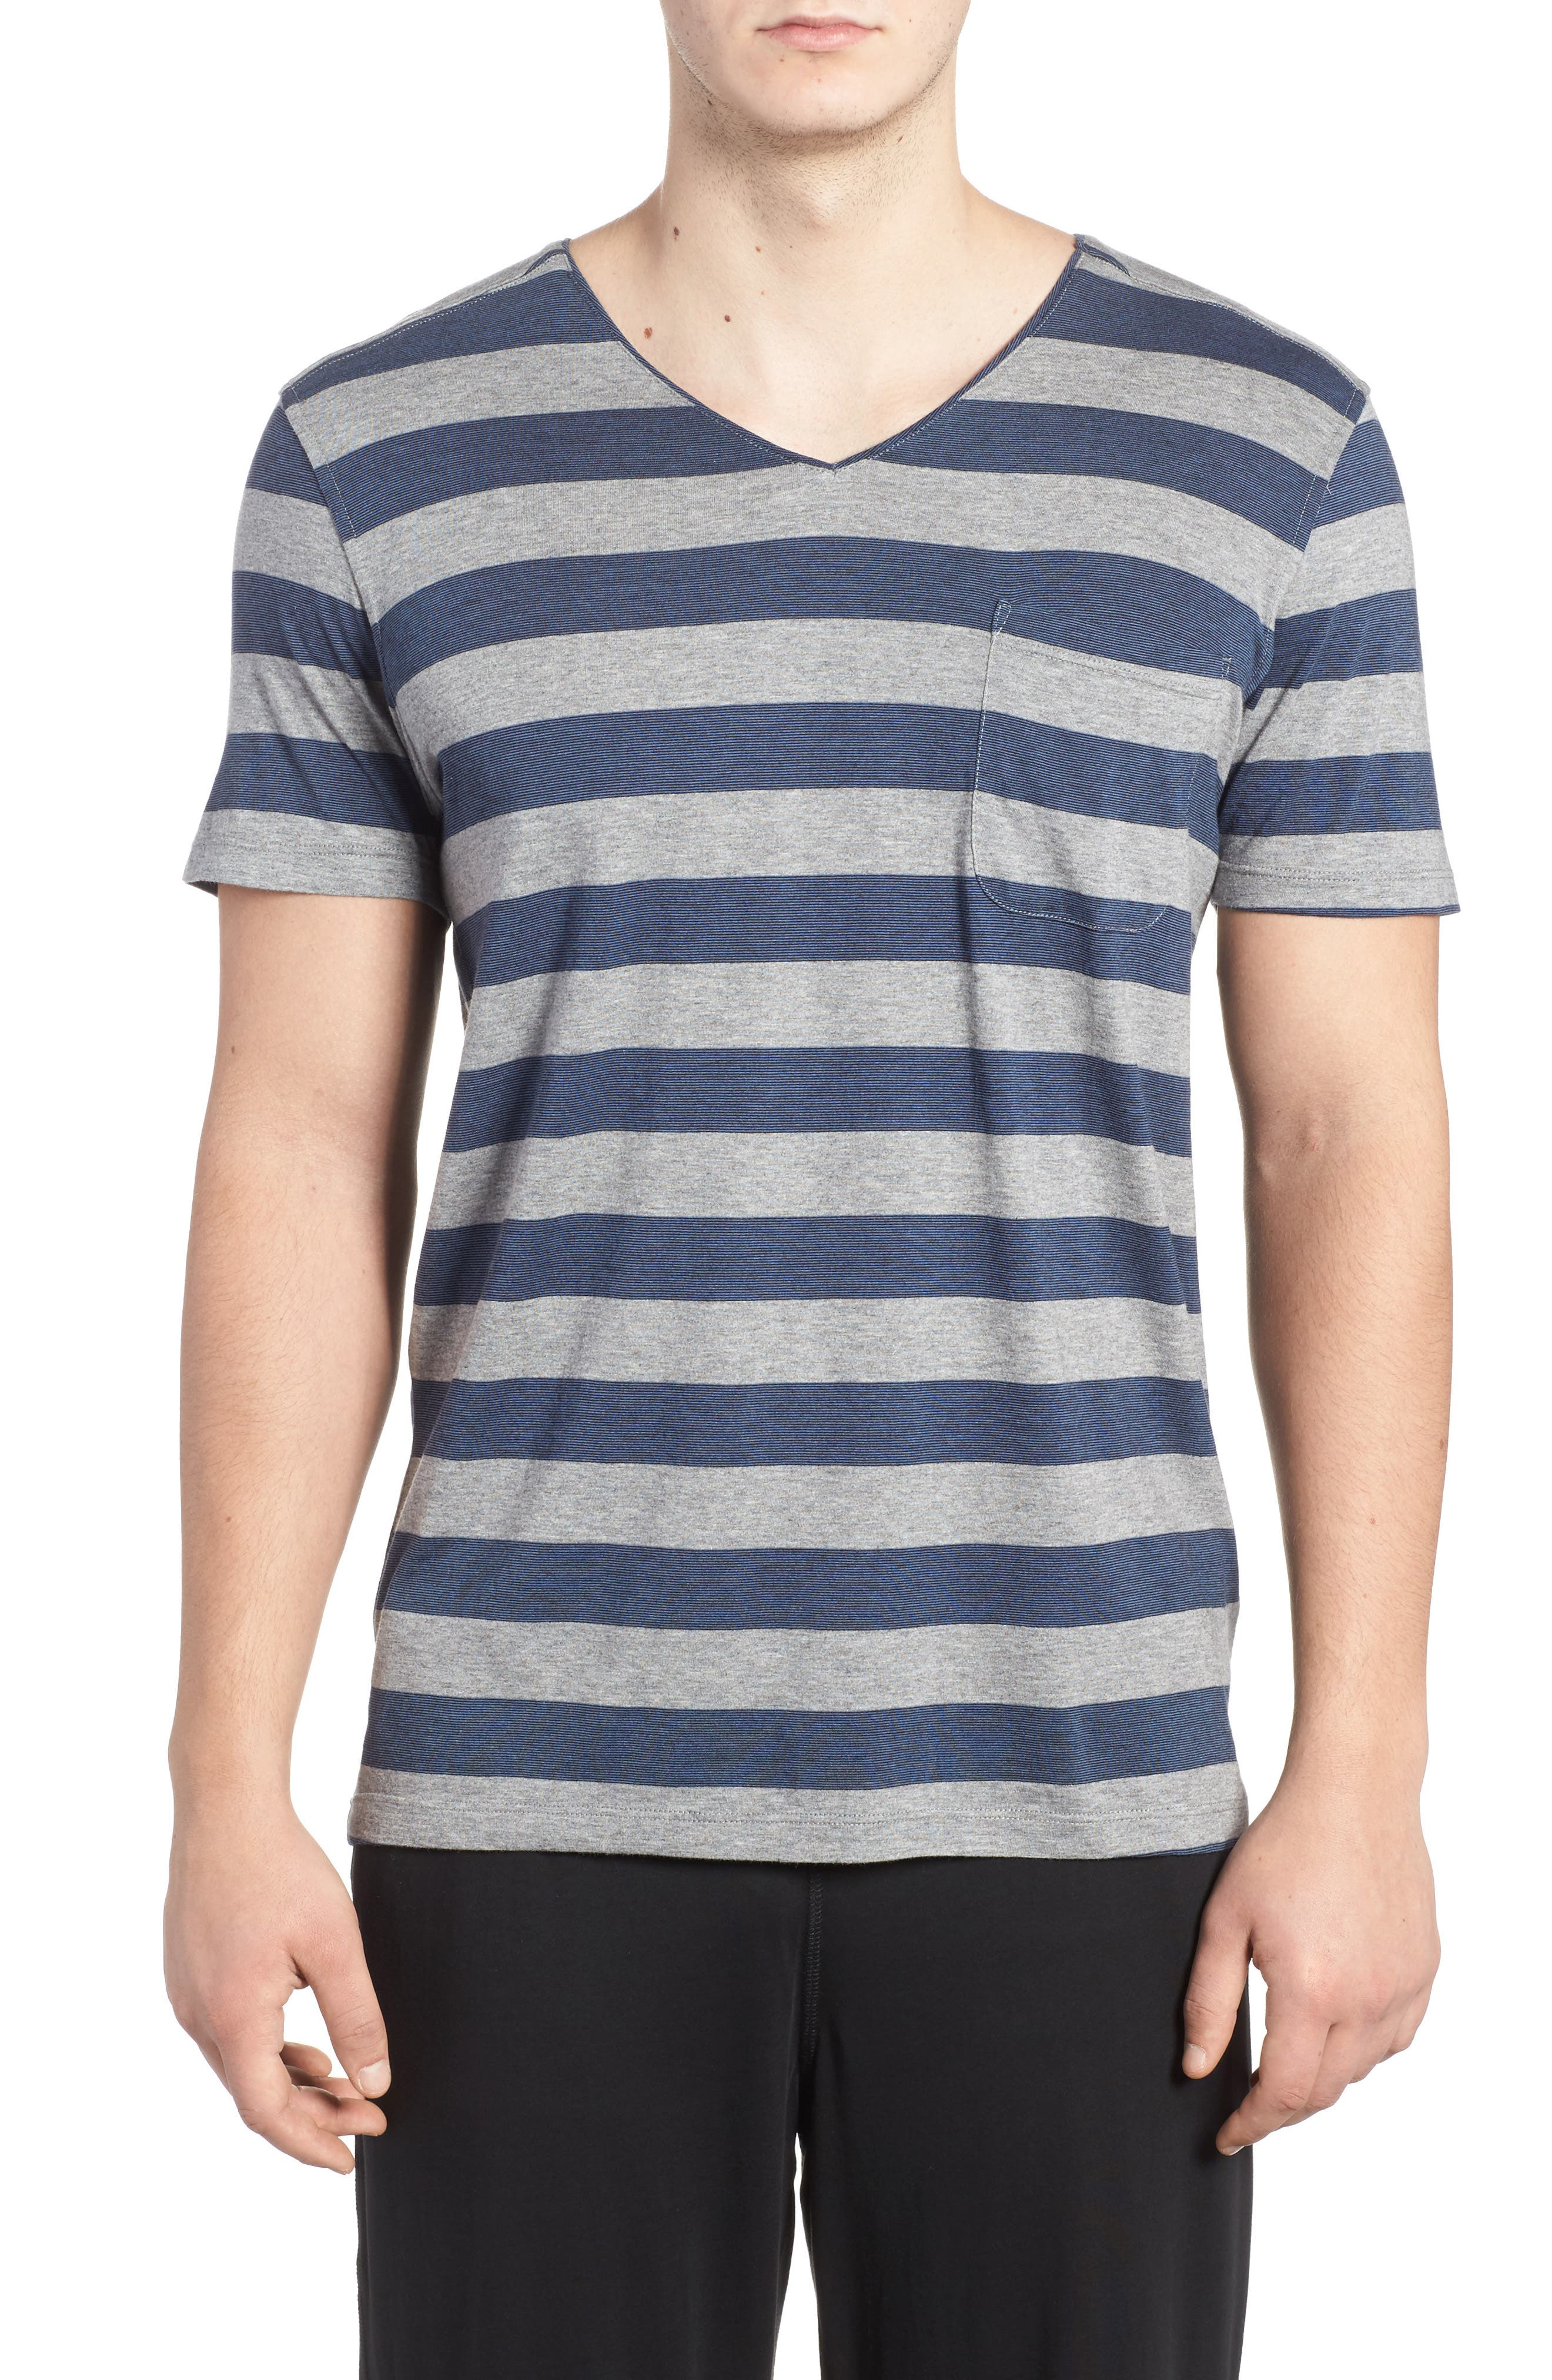 Main Image - Daniel Buchler Stripe Pima Cotton & Modal V-Neck T-Shirt